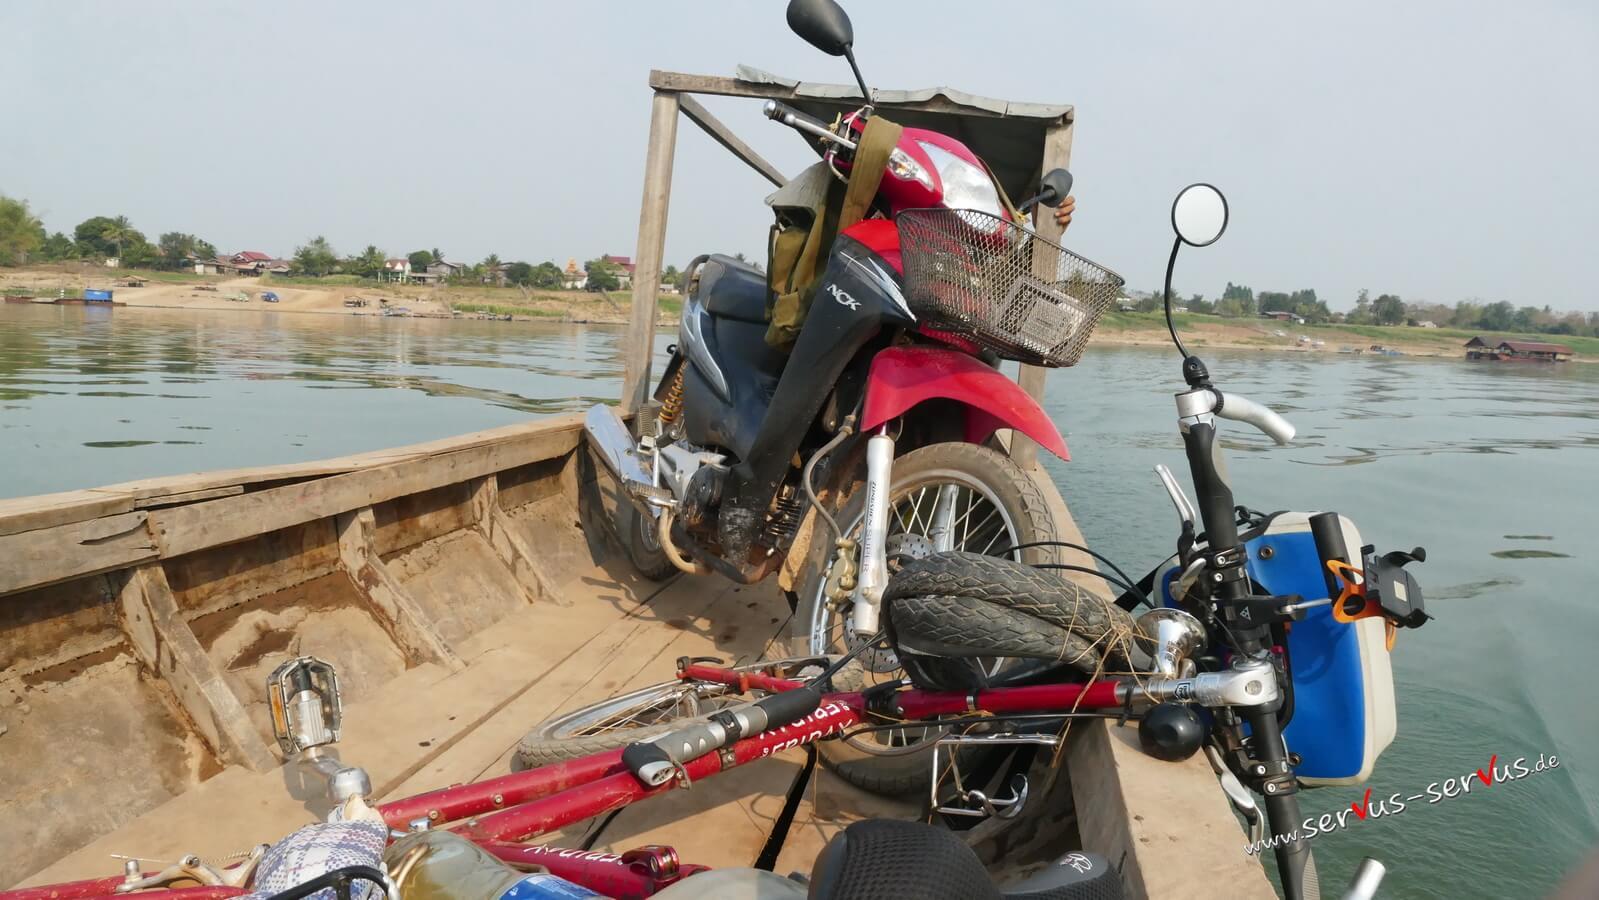 Fahrrad, Boot Moped, Mekong